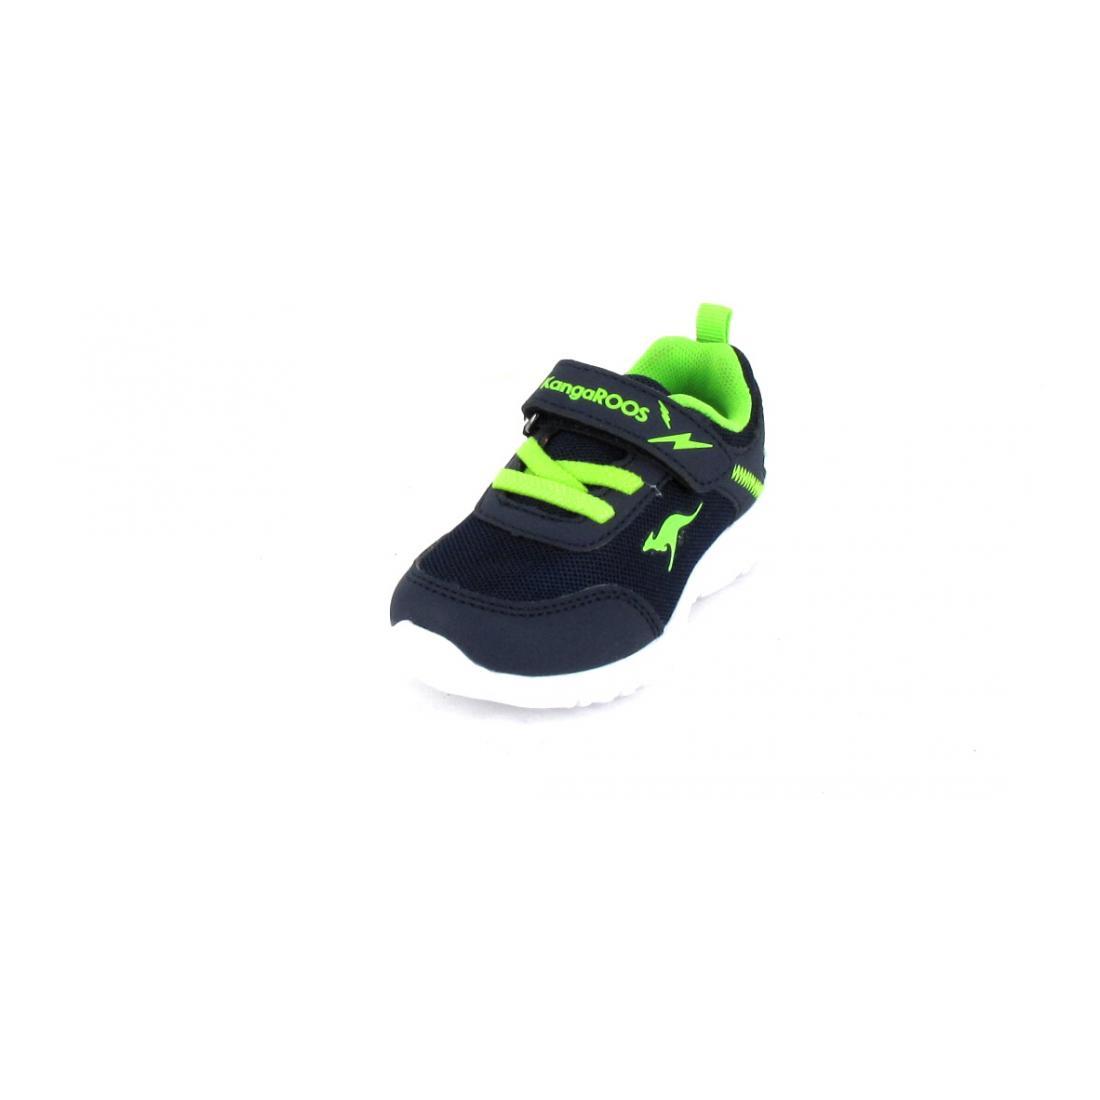 KangaRoos Sneaker KY-Flight EV